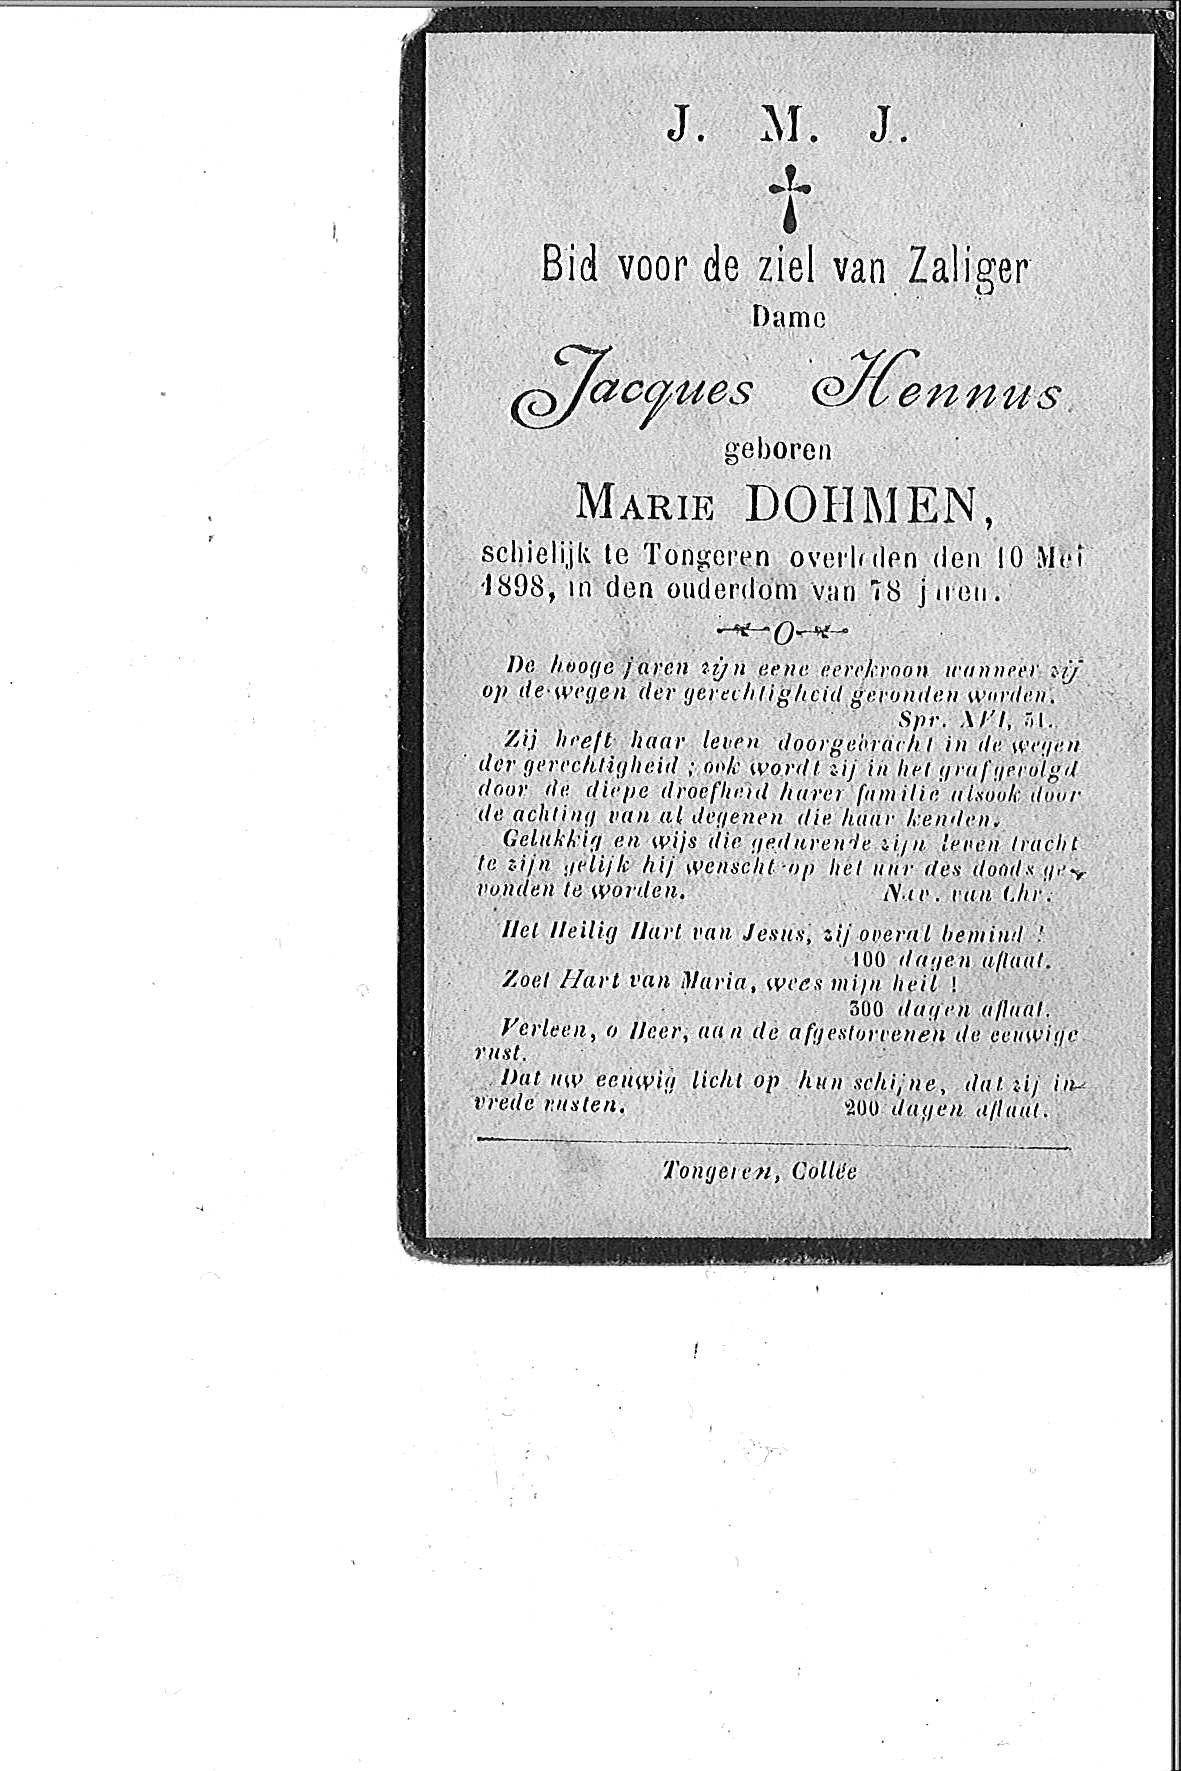 Jacques(1898)20141202162903_00007.jpg